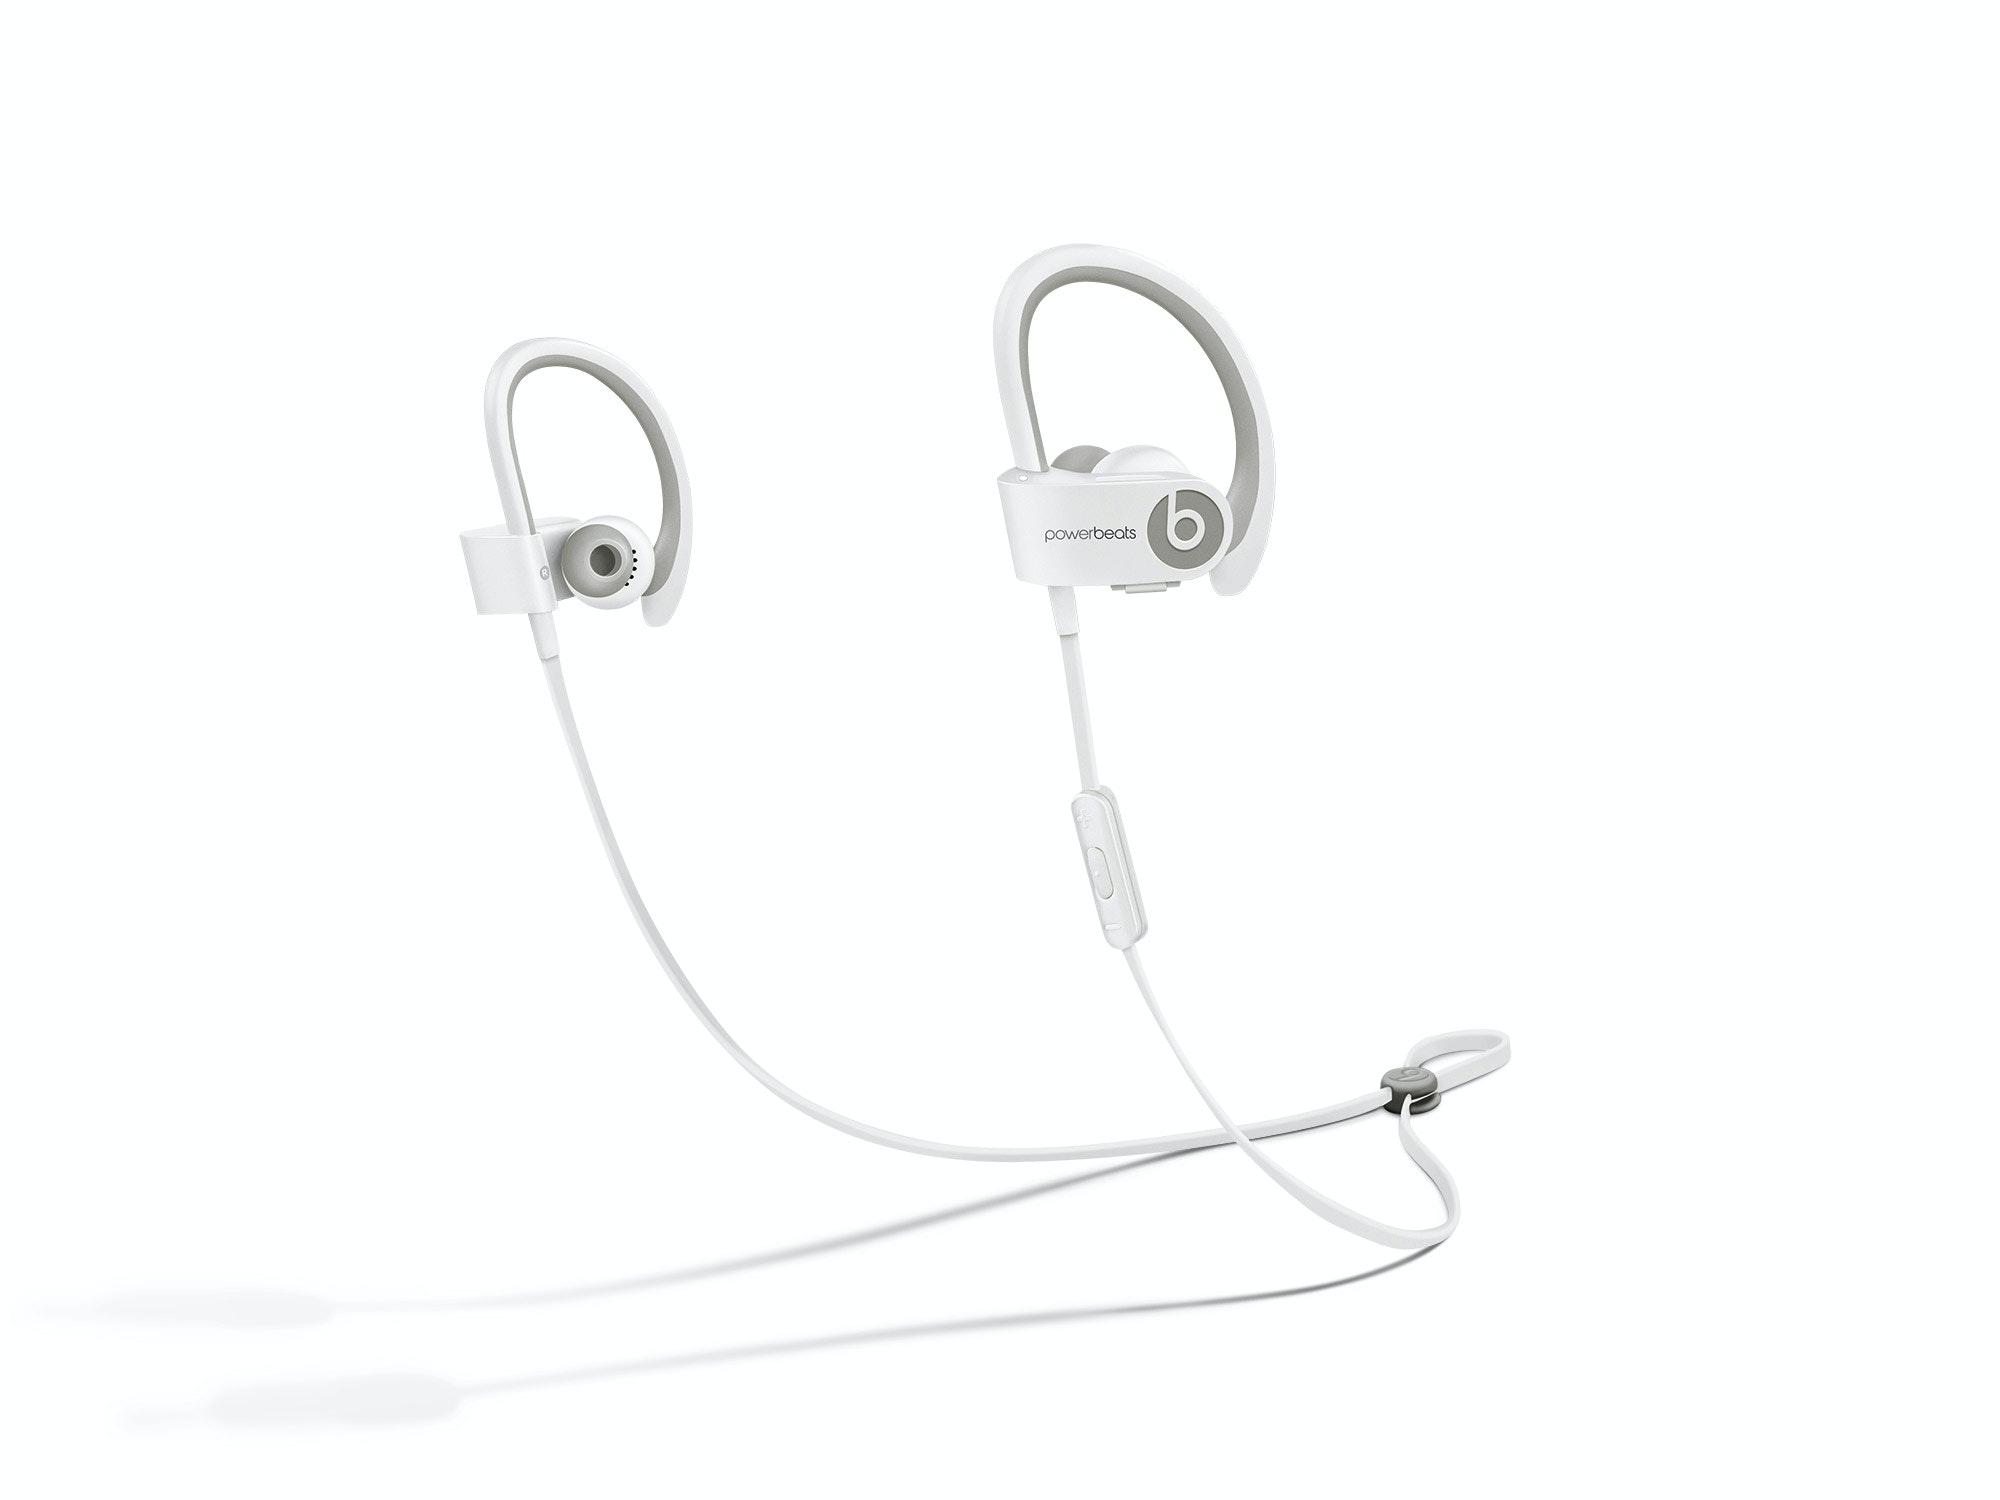 Wireless Bluetooth Headphones : Powerbeats2 | Beats by Dre